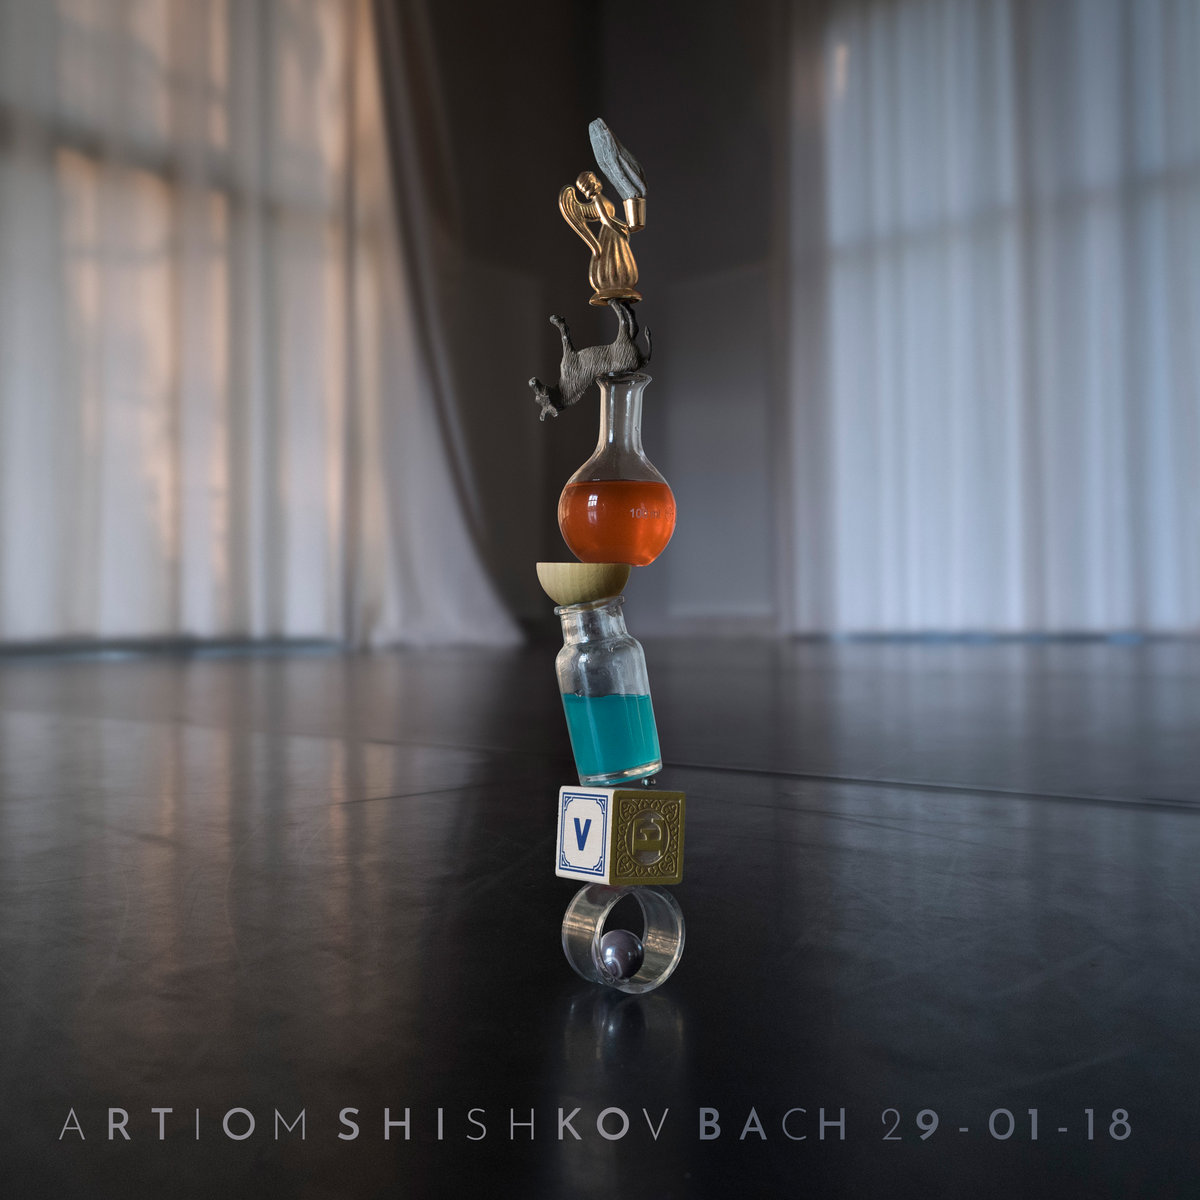 Amber Bach bach 29-01-18 | artiom shishkov